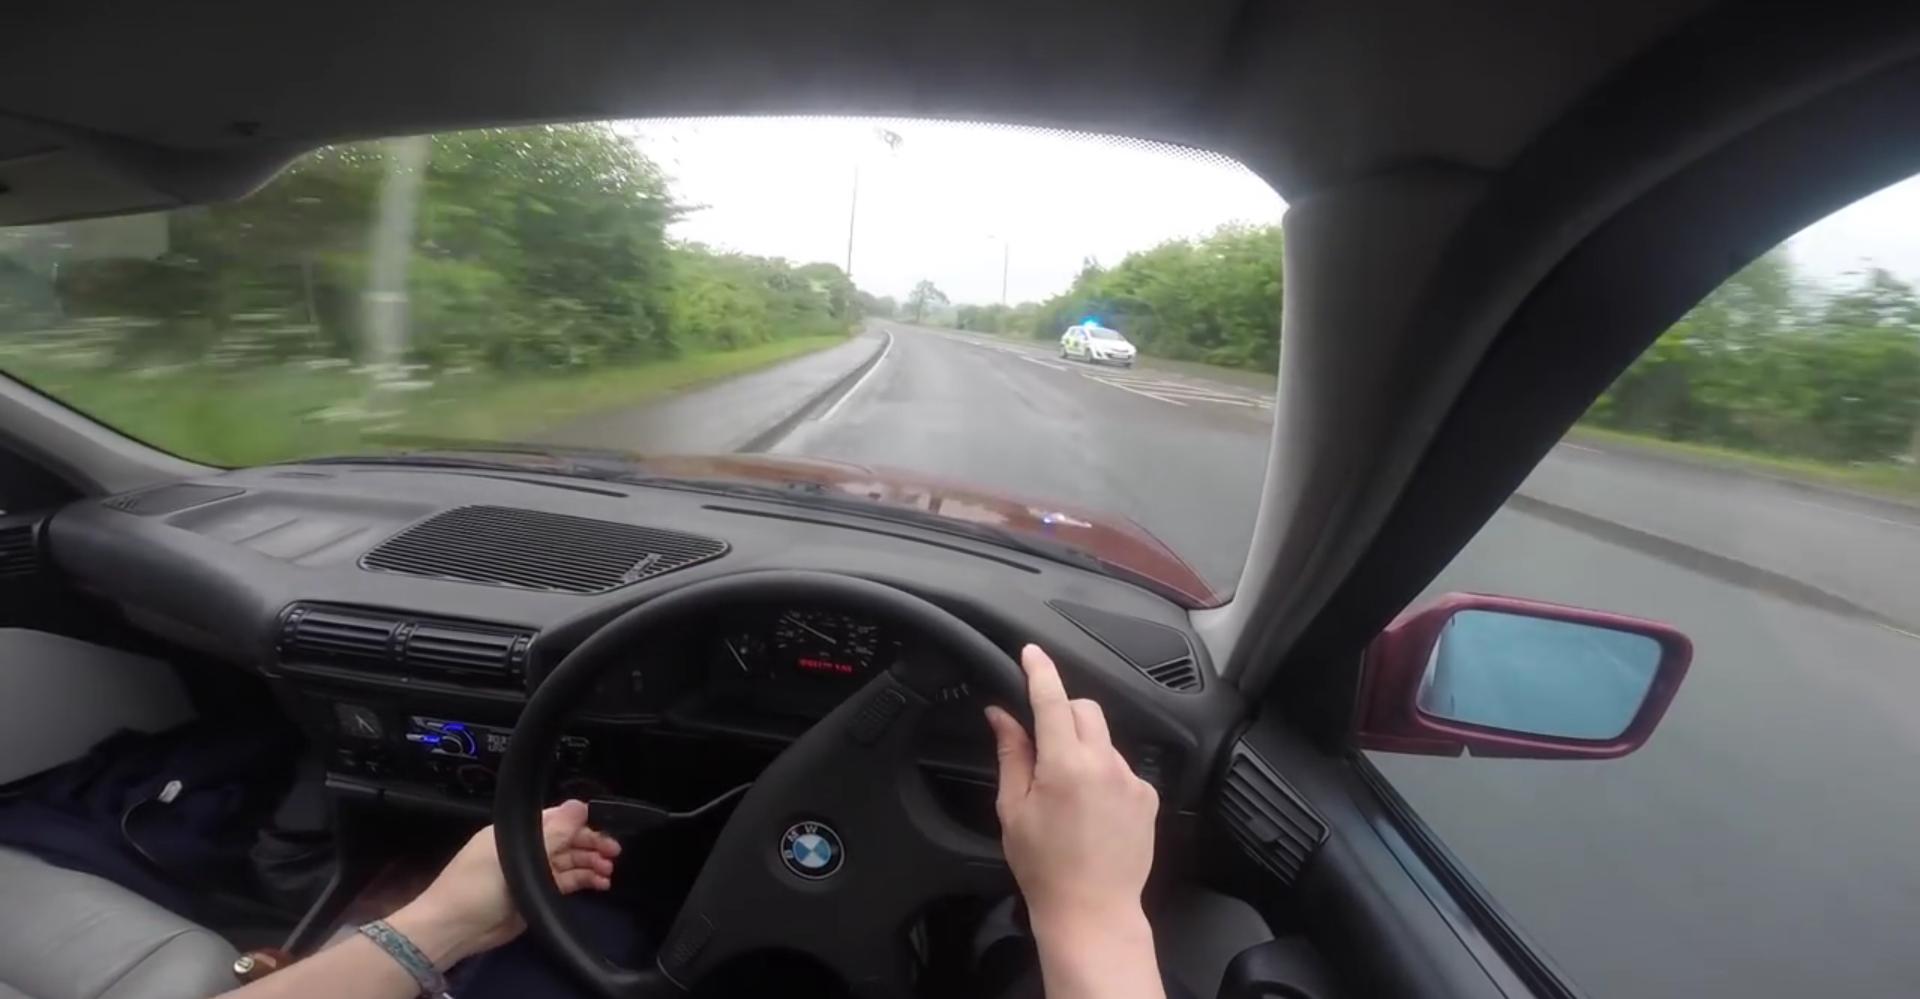 dumbass drifting a bmw inside a roundabout meets police car